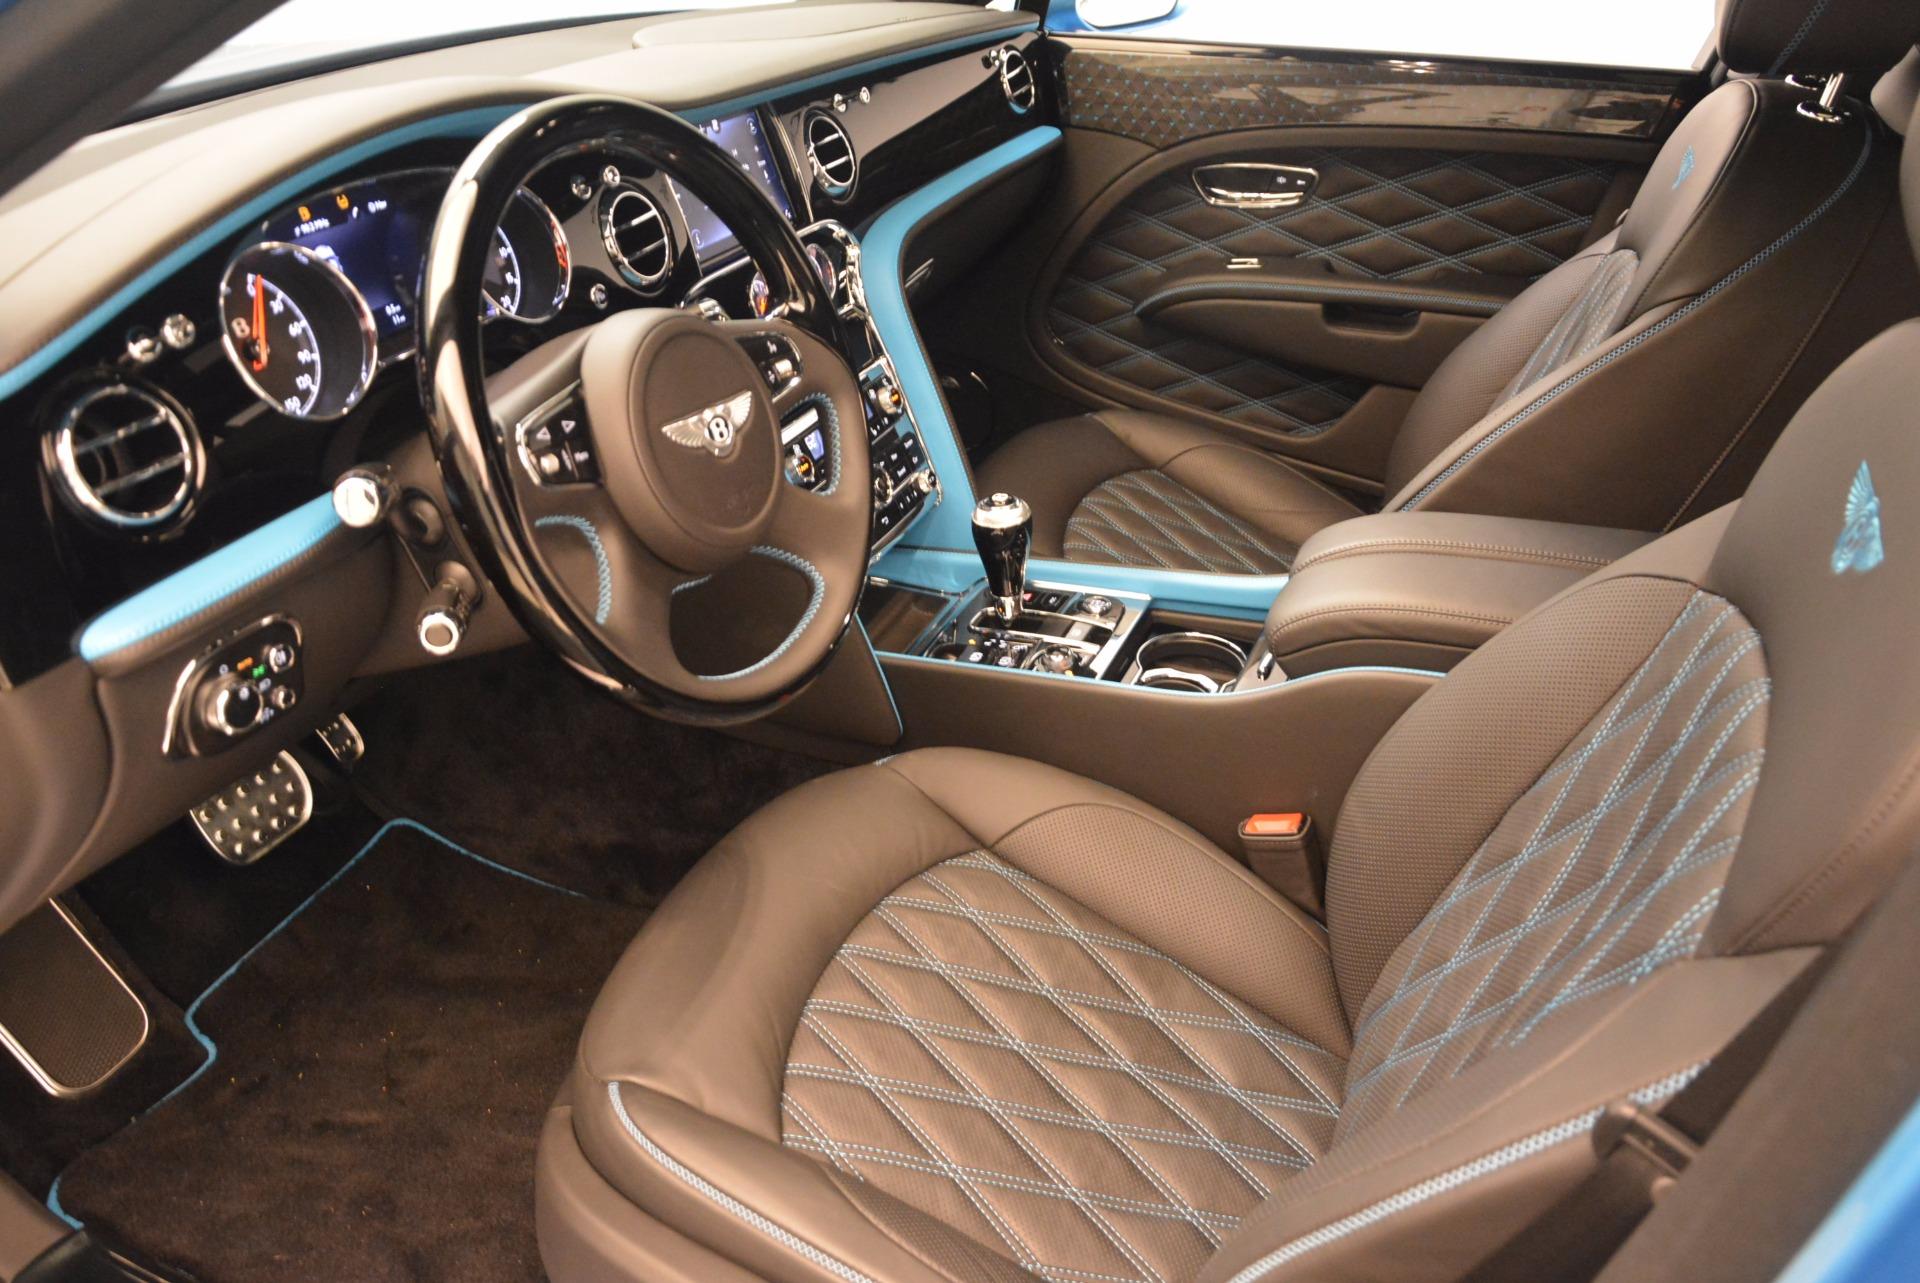 Bentley Mulsanne 2018 | Best new cars for 2018 on bentley truck, lamborghini urus interior, bentley interior wallpaper, jaguar xj interior, bentley coupe on 26s, cadillac escalade interior, bentley continental gt interior, bentley turbo r, porsche panamera interior, bentley hunaudieres interior, bentley coupe interior, bentley eight interior, bentley limo interior, bentley auto interior, bentley arnage, bmw 7 series interior, bentley brooklands, mclaren f1 interior, lamborghini gallardo interior, bentley car's interior,